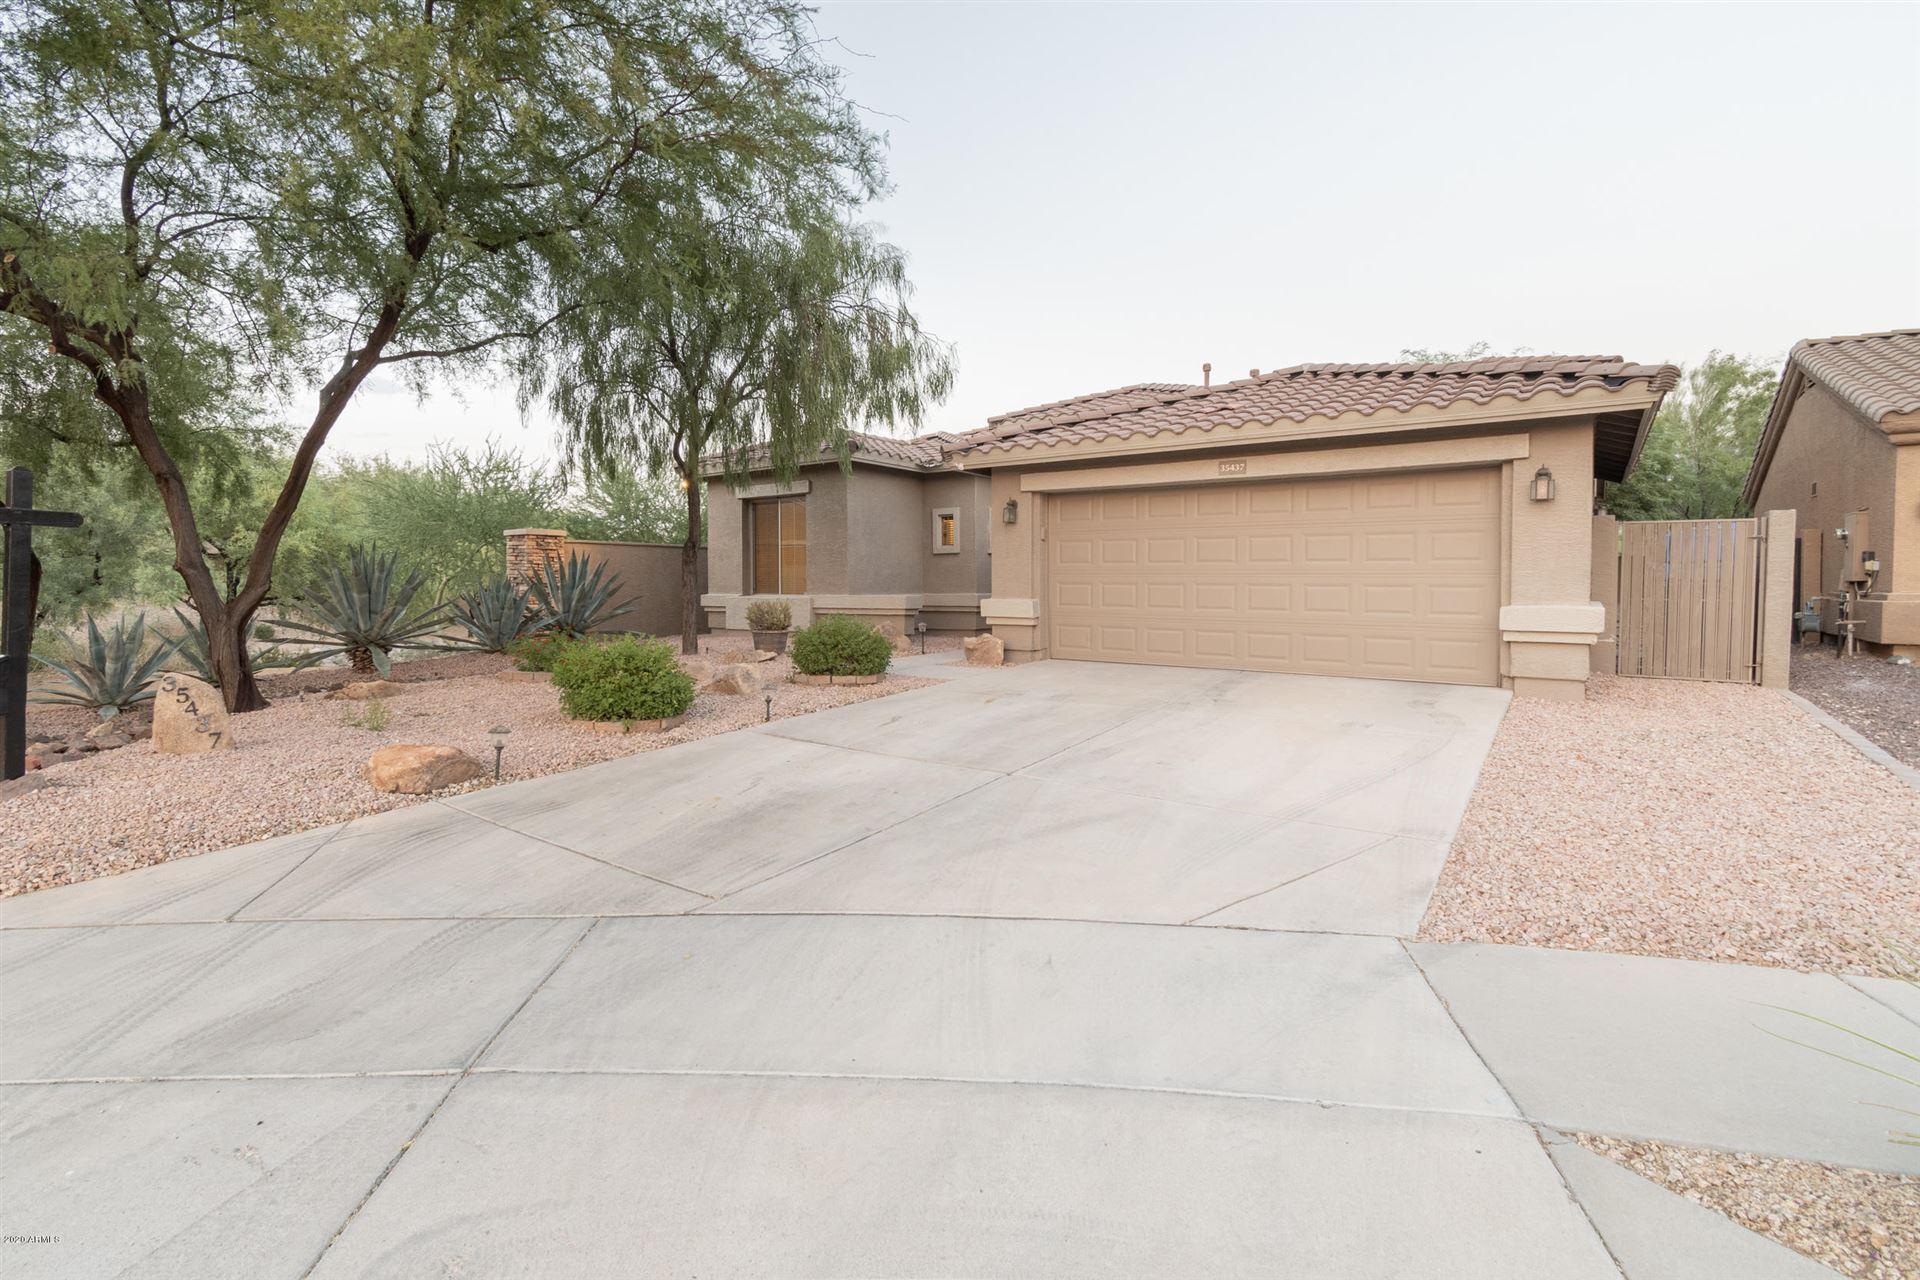 35437 N 34TH Avenue, Phoenix, AZ 85086 - MLS#: 6126892